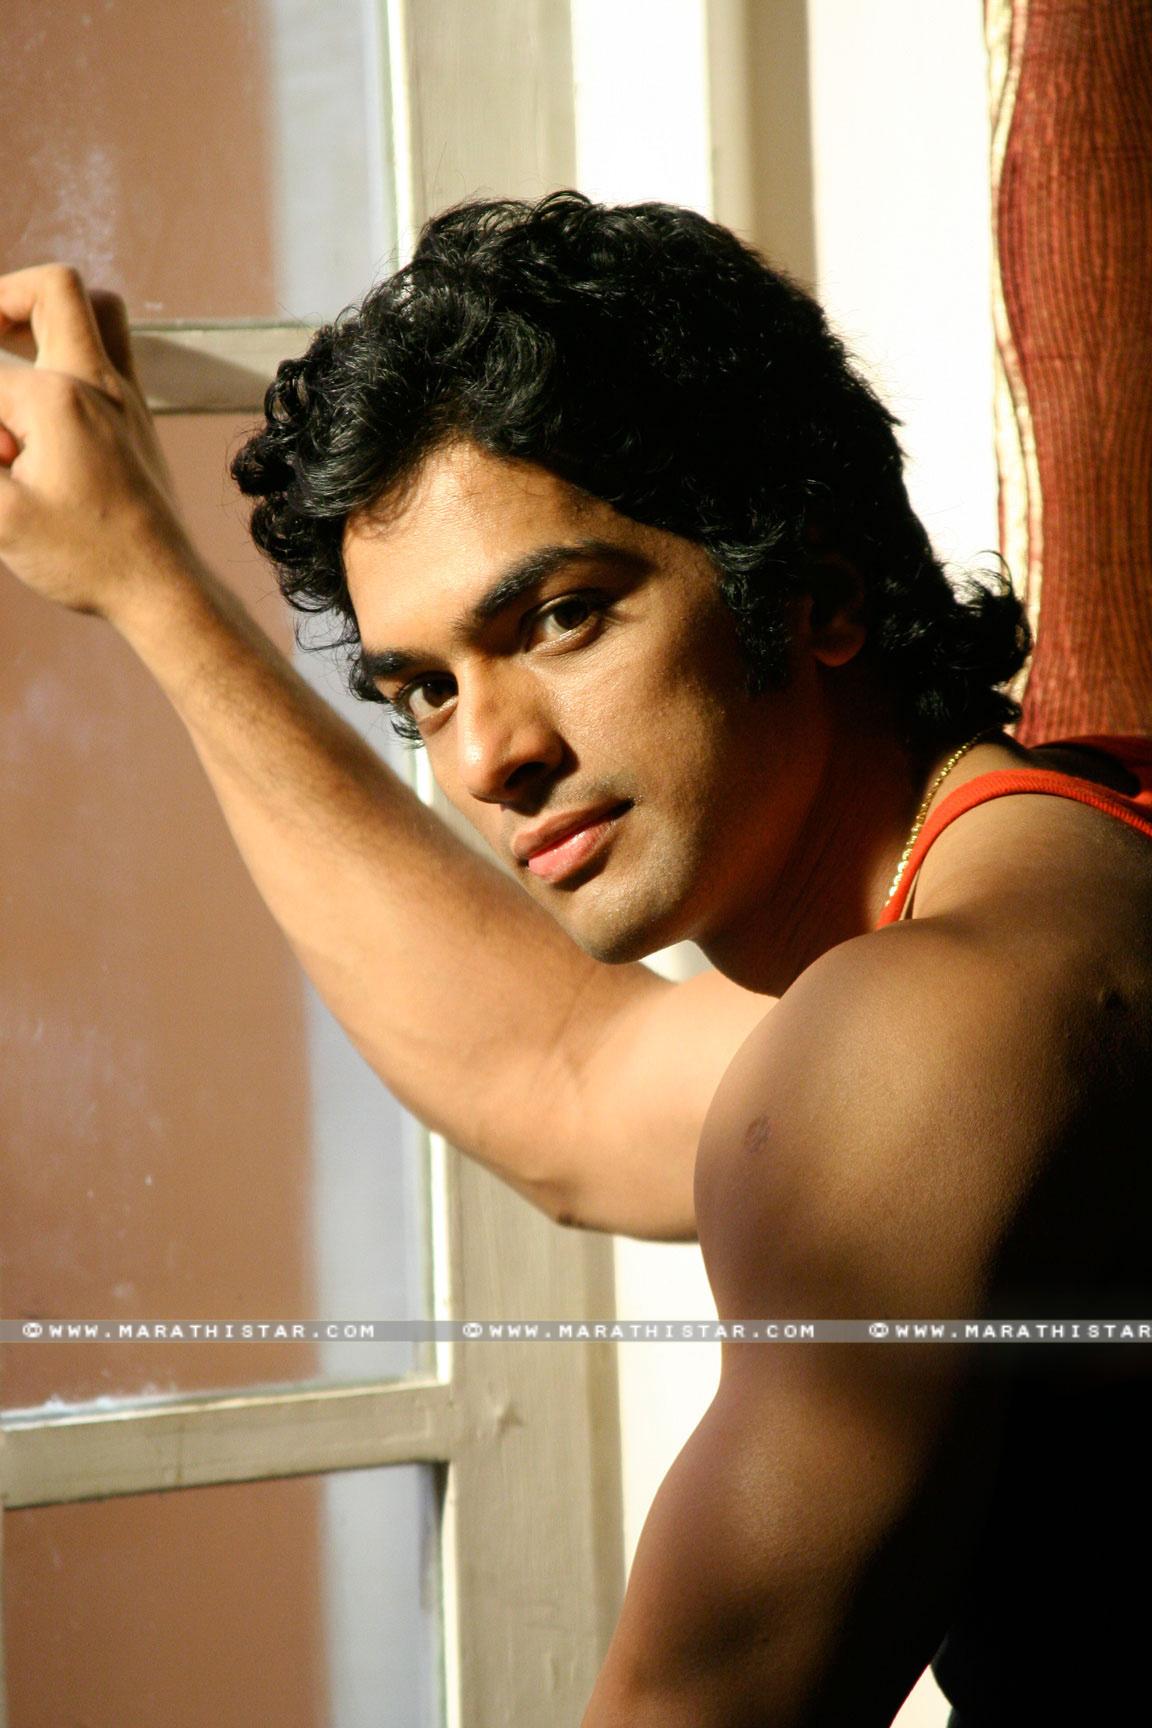 marathi actors biography profile photo gallery